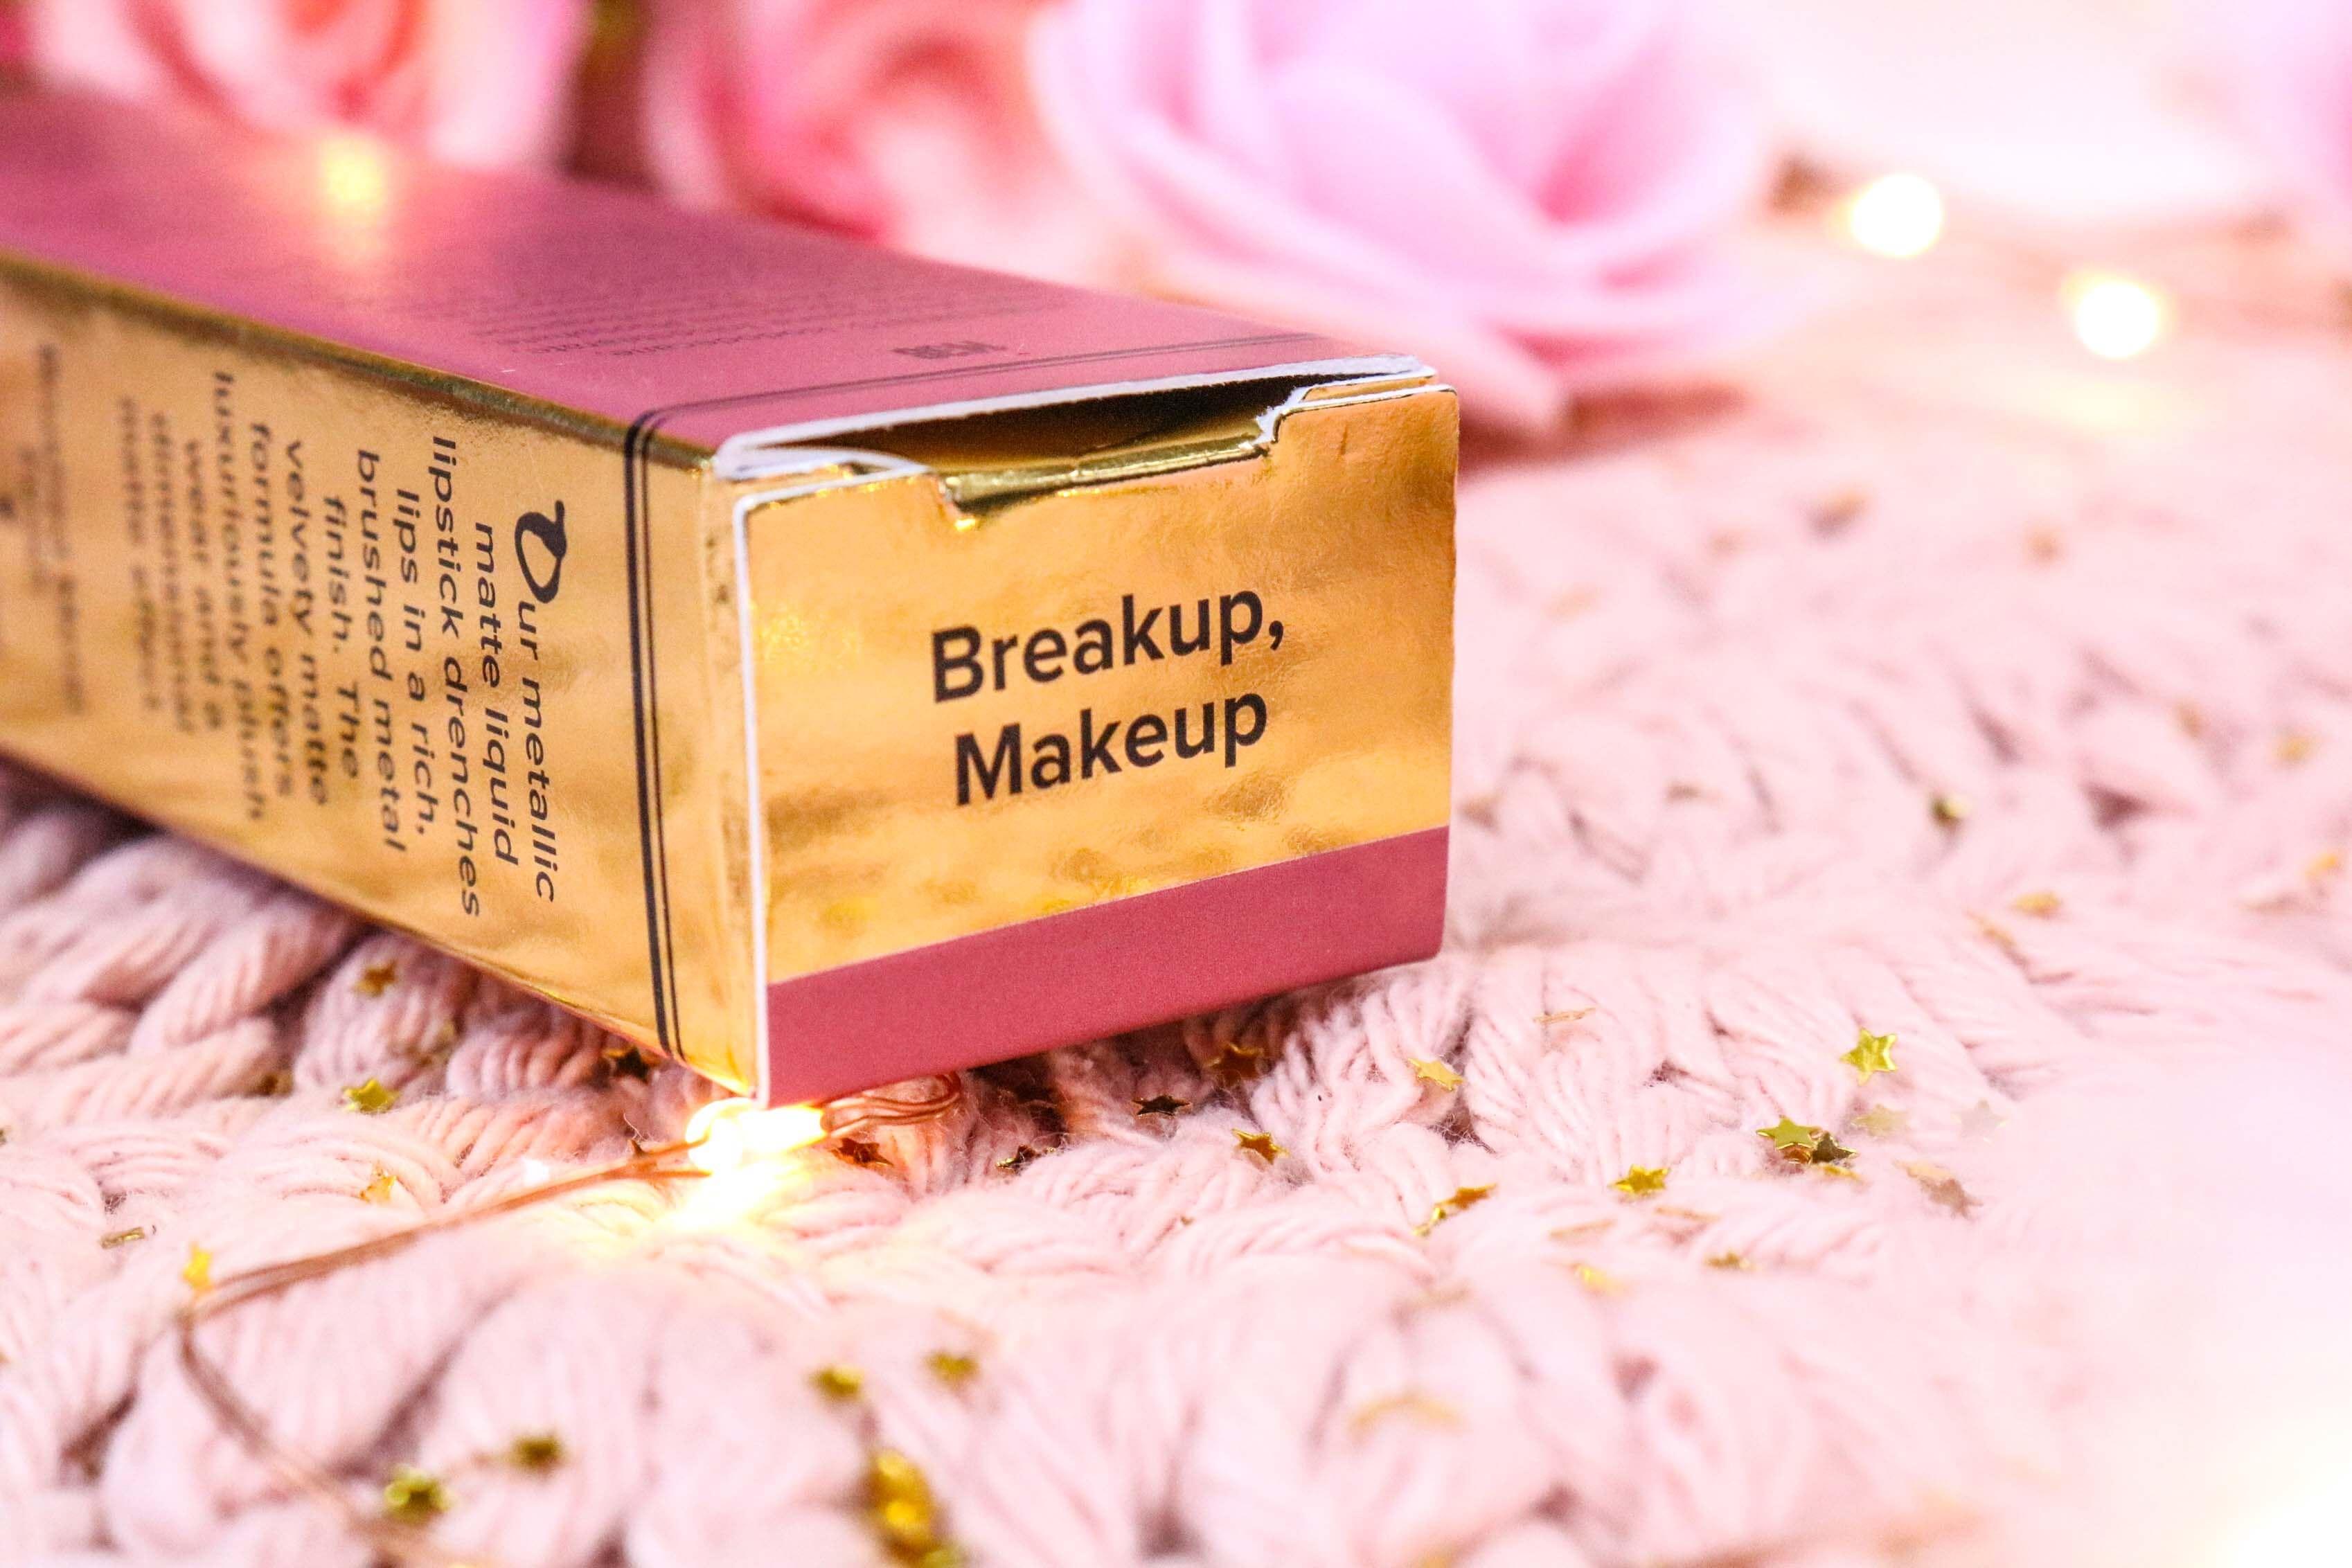 revue-melted-matte-tallic-rouge-a-levres-breakup-makeup-makeupbyazadig-sortie-france-influencer-swatch-avis-prix-gold